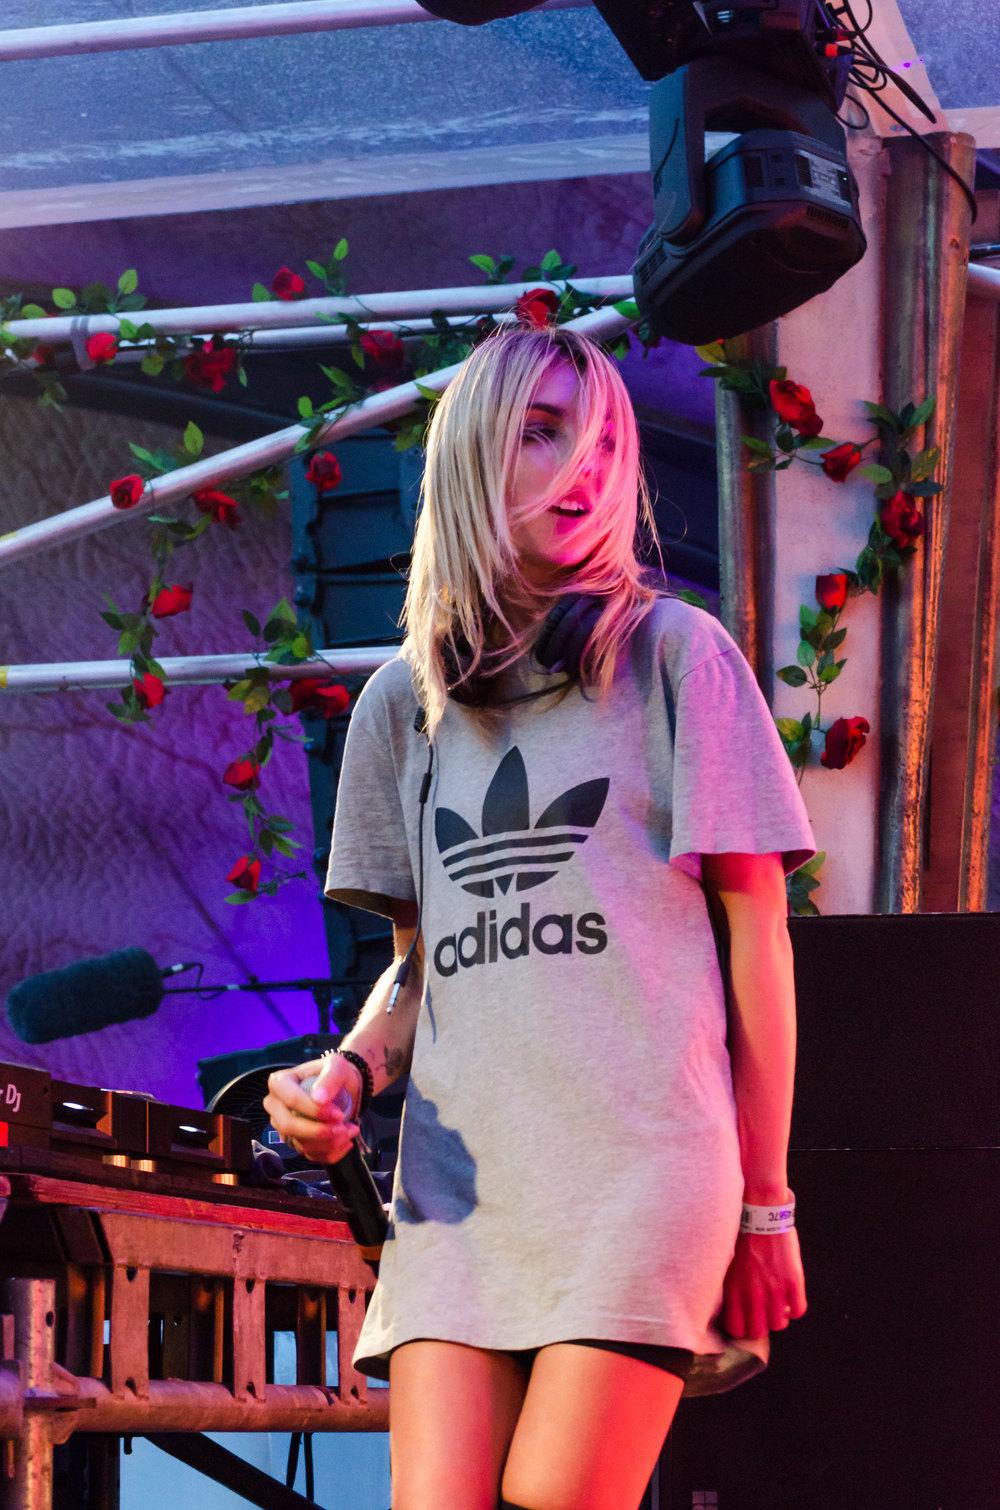 Alison-Wonderland-Tomorrowland-2016-4-casenruiz.jpg